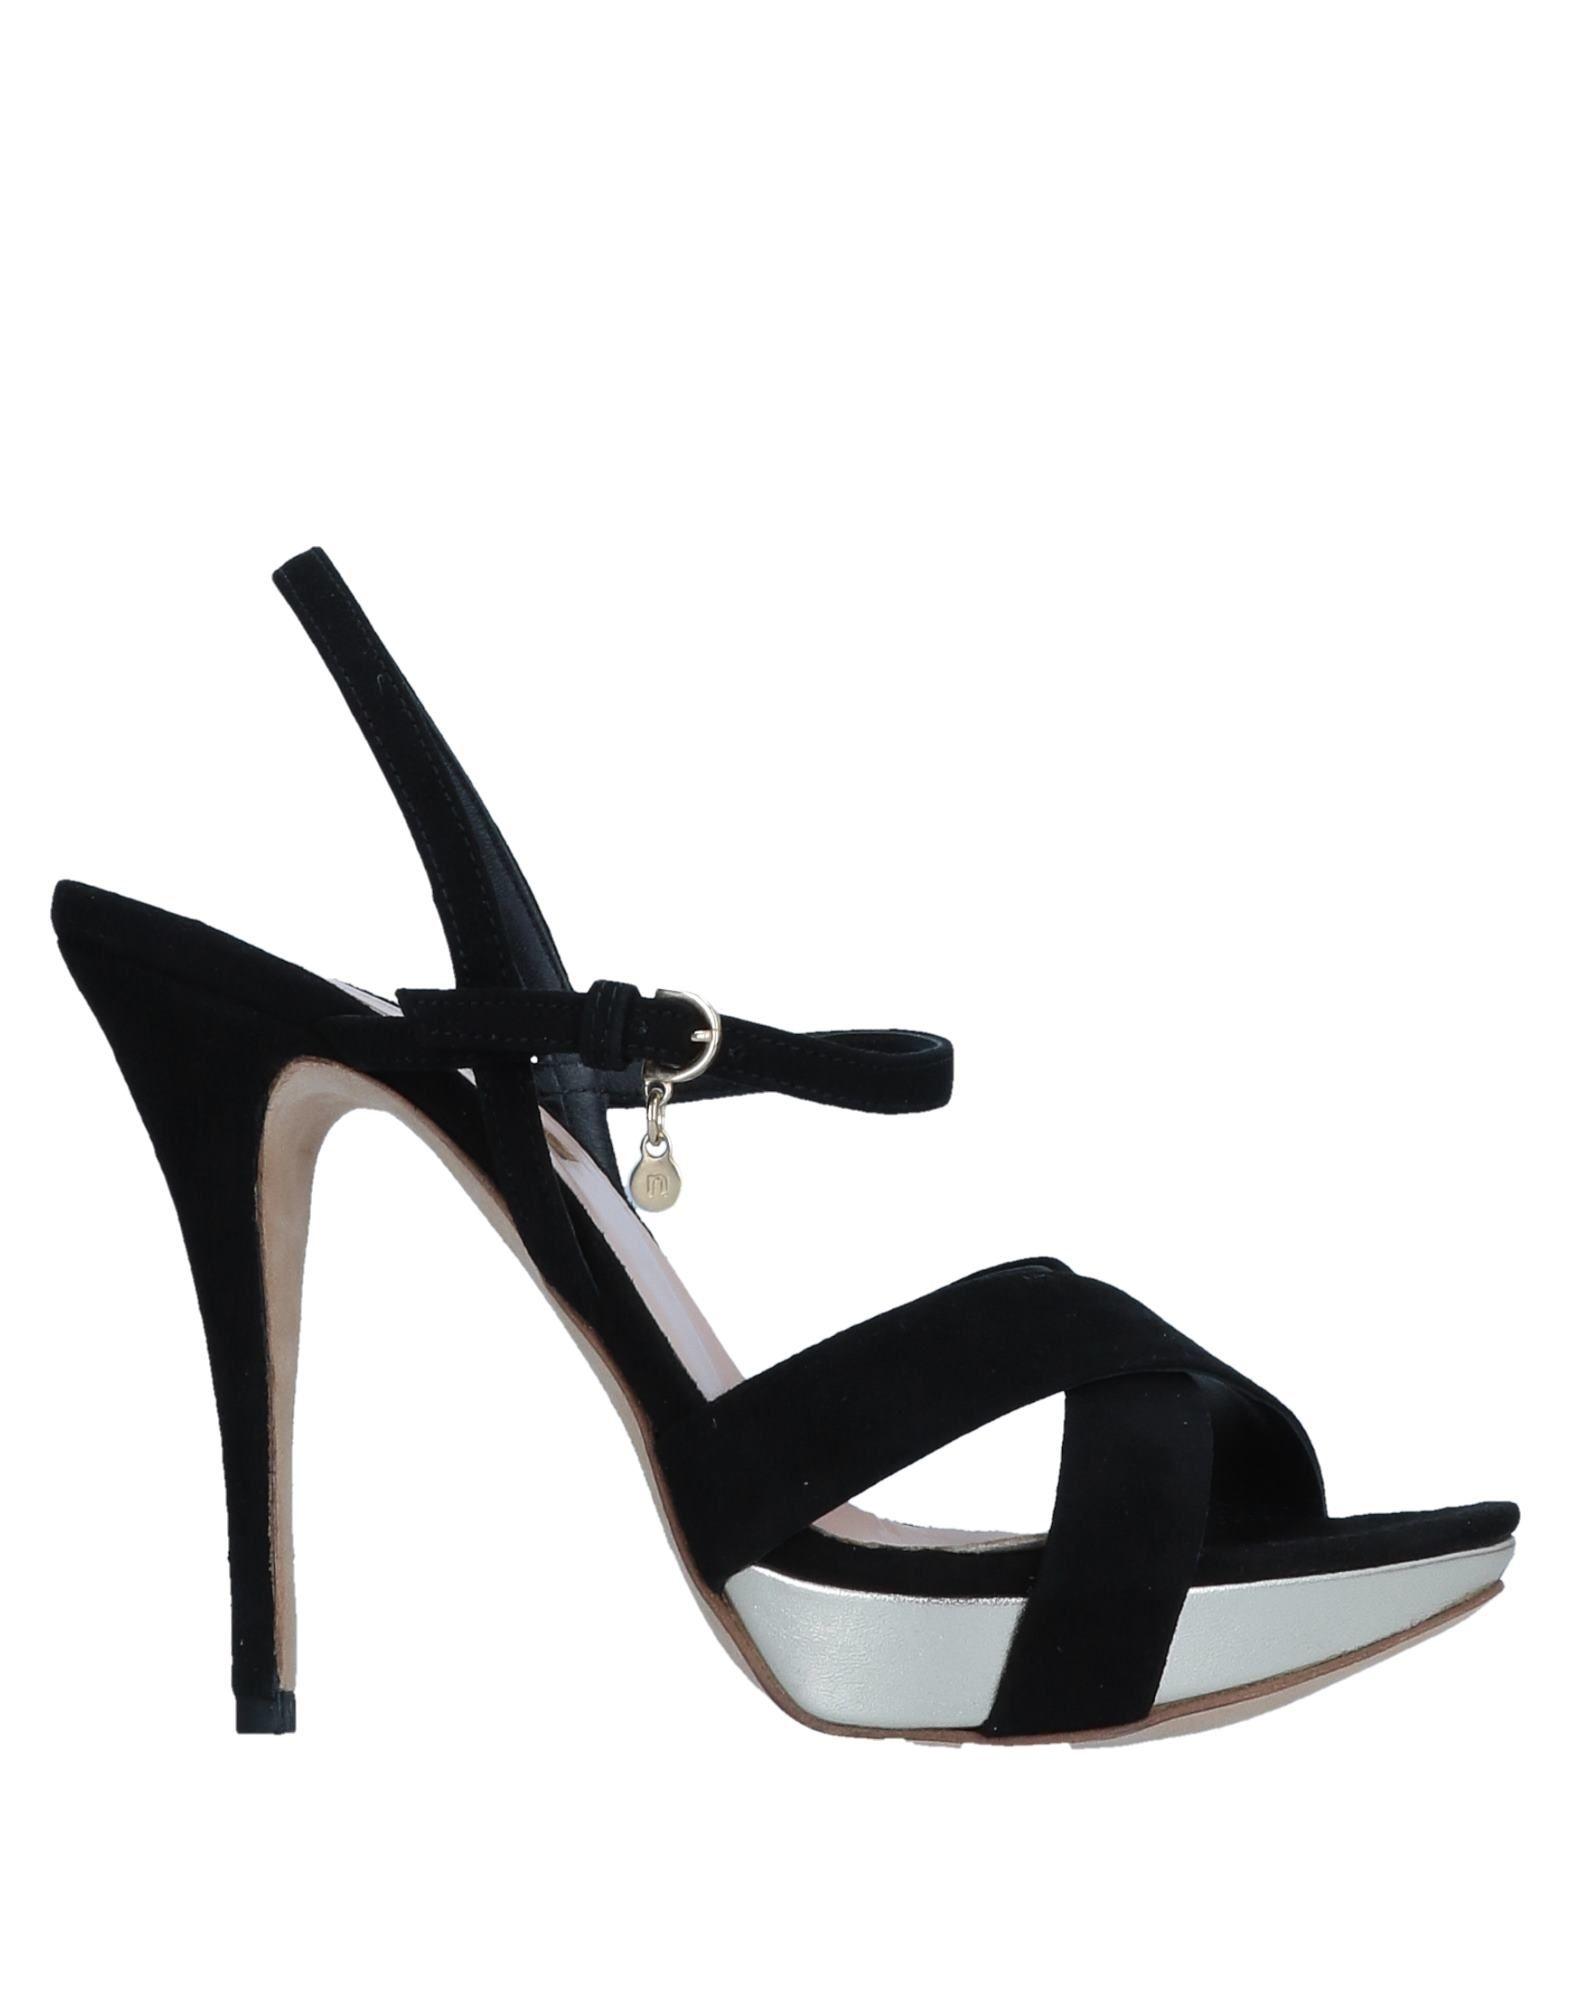 Nila & Nila Sandalen Damen beliebte  11557778NV Gute Qualität beliebte Damen Schuhe 3ed38e